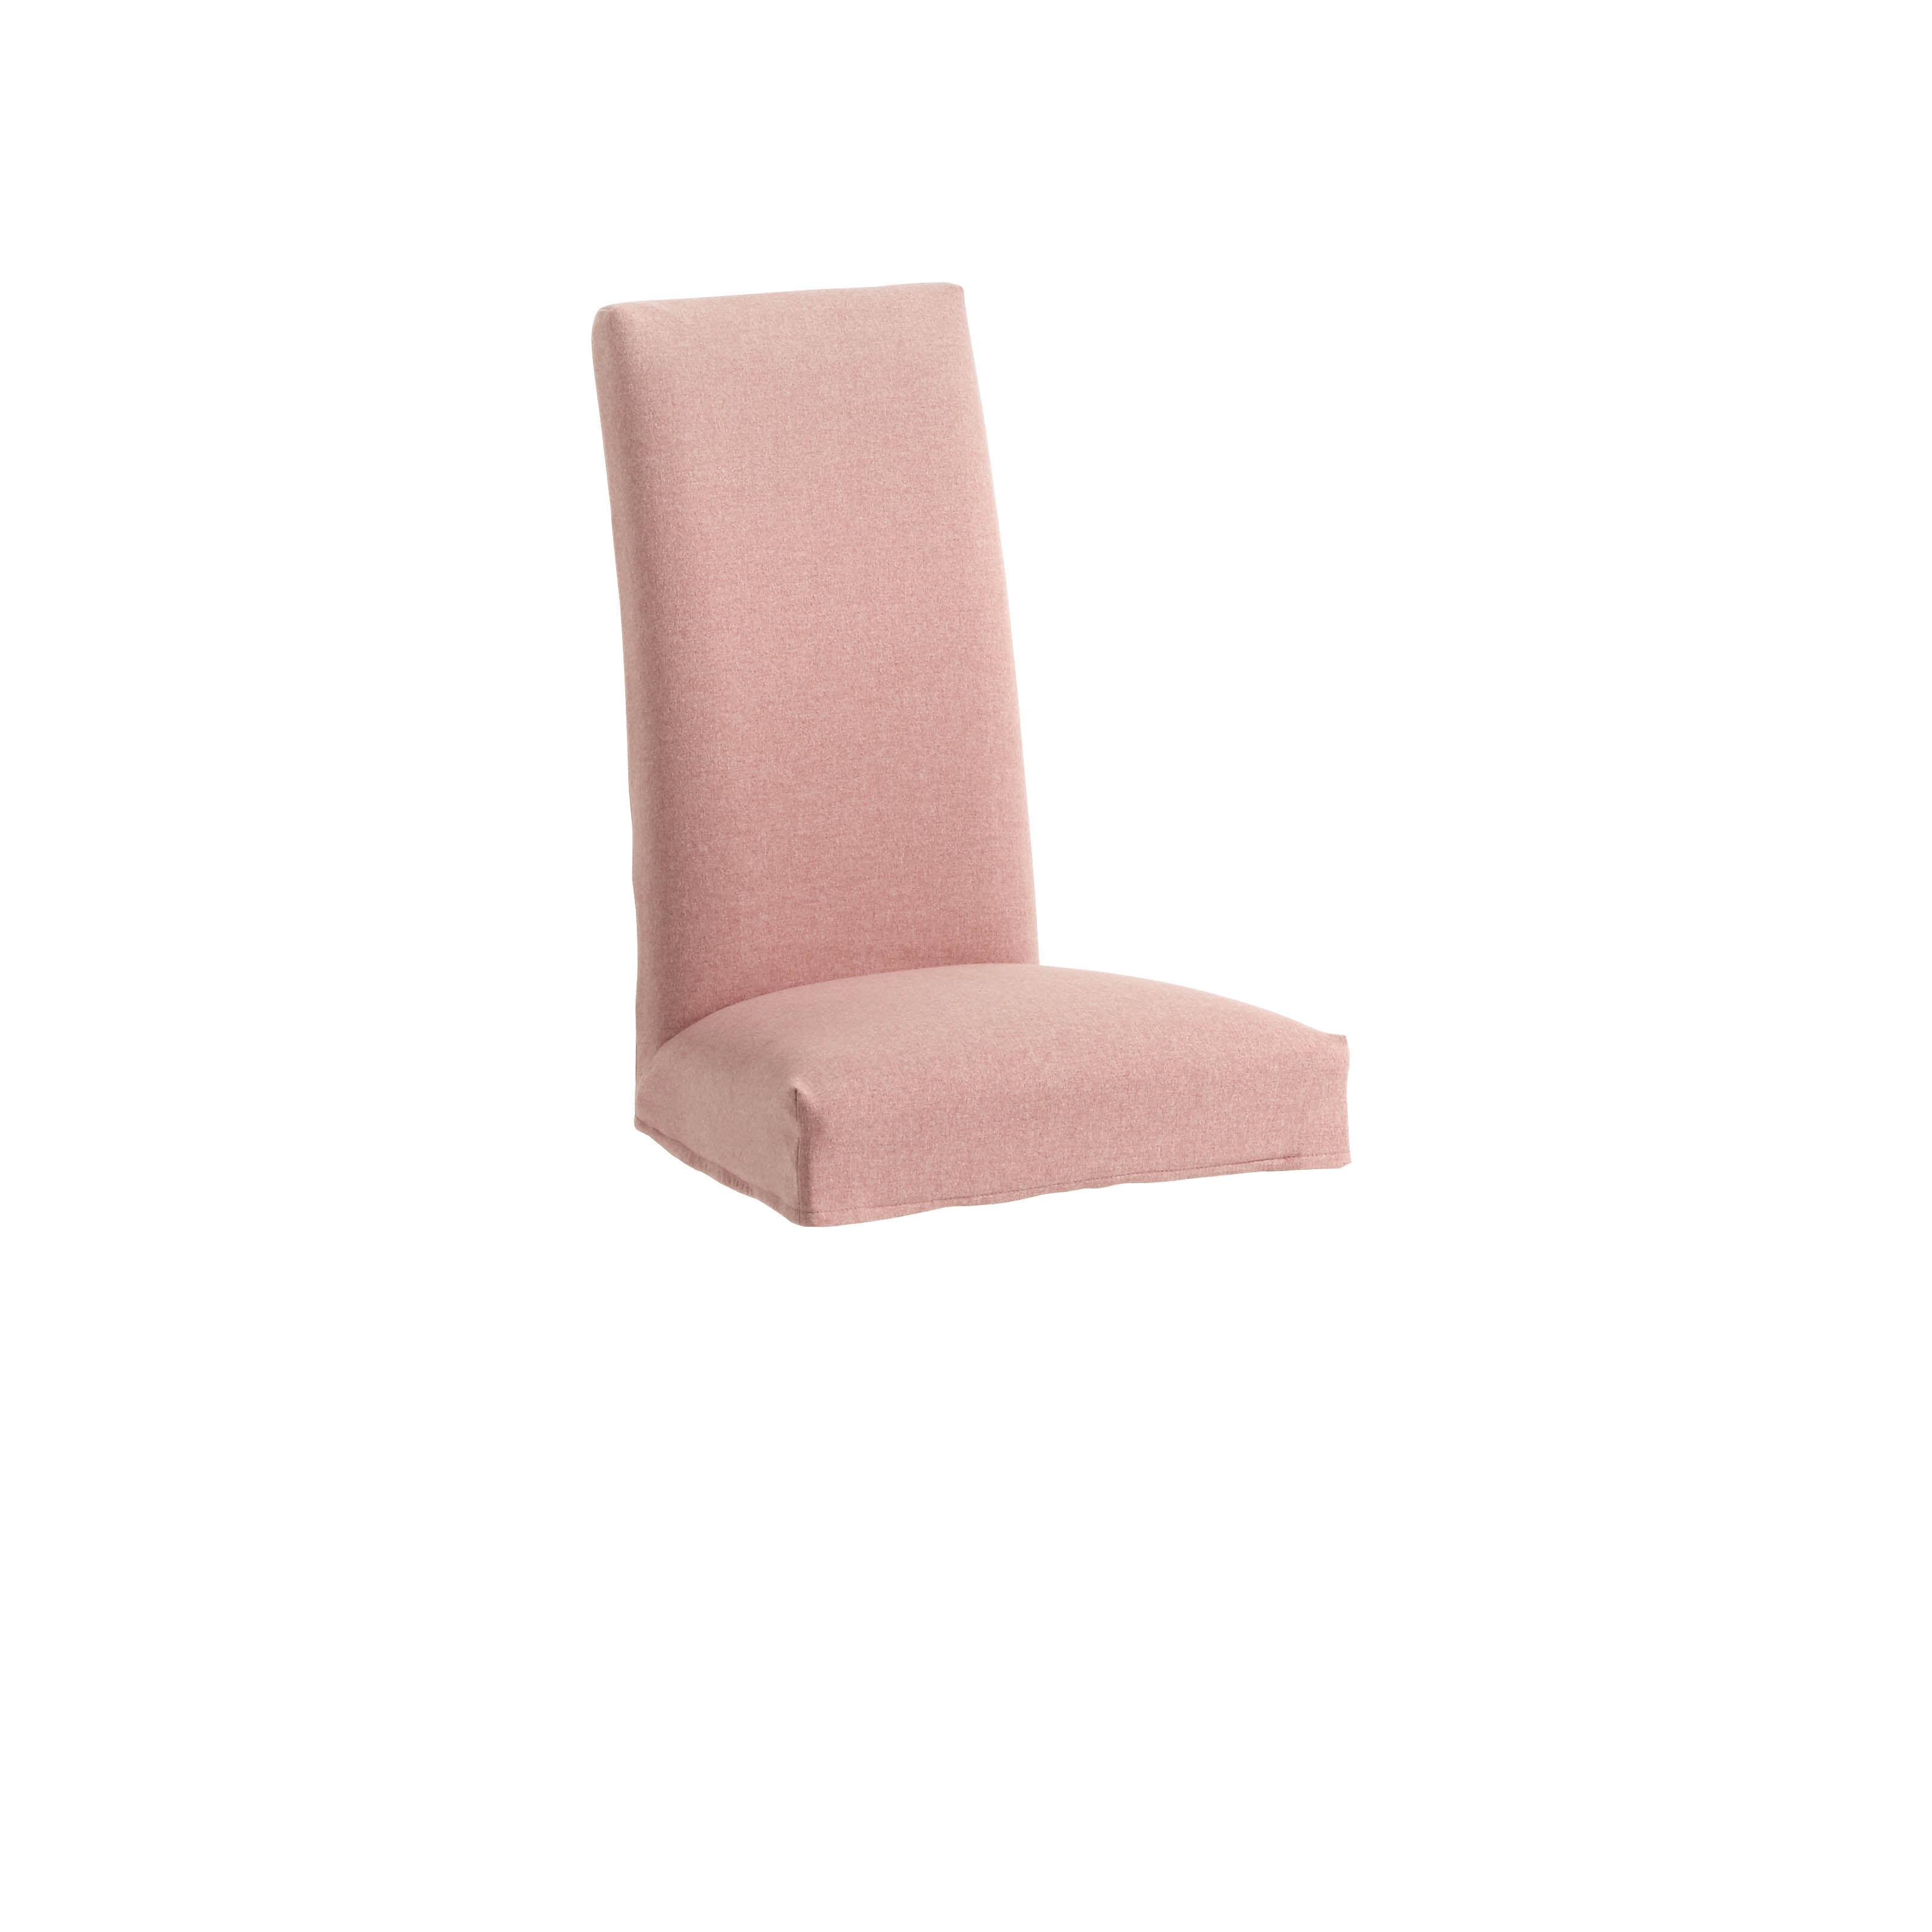 Kave Home Fodera per sedia Freda rosa